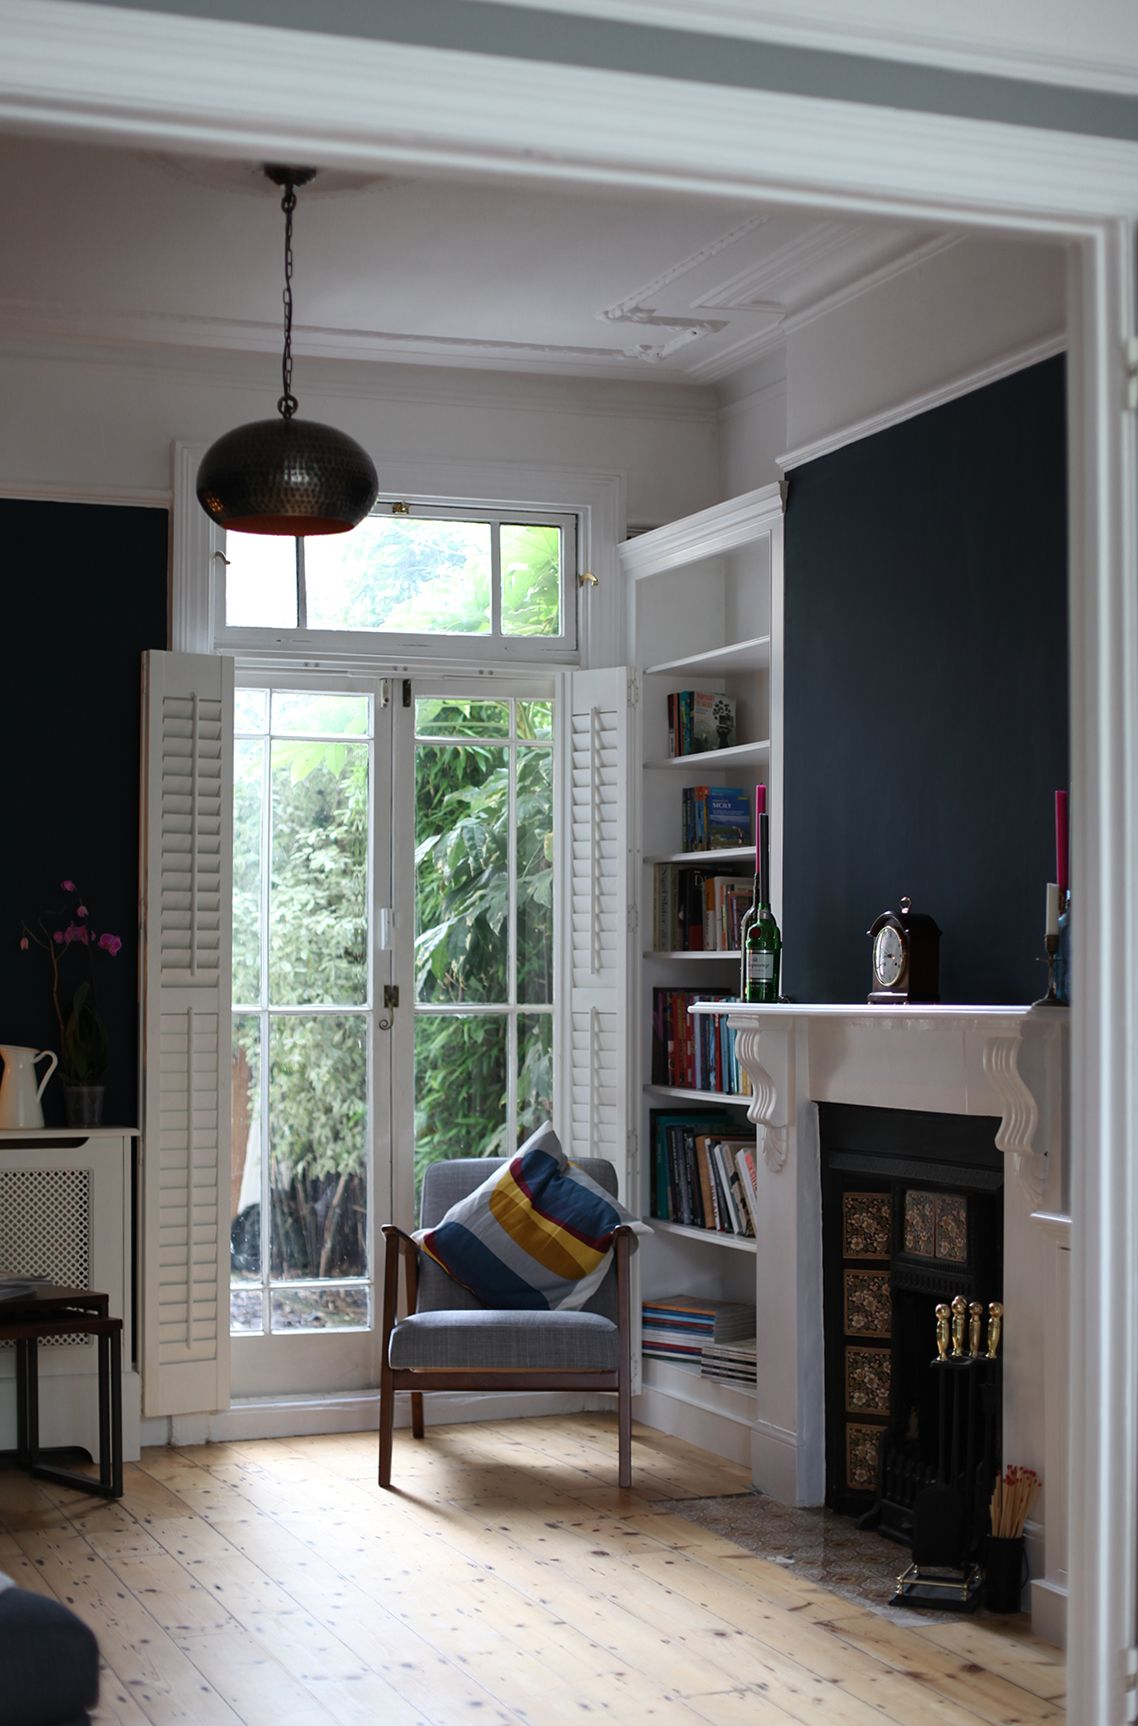 living room dark furniture decorating ideas center table for farrow & ball hague blue no. 30 estate emulsion this ...